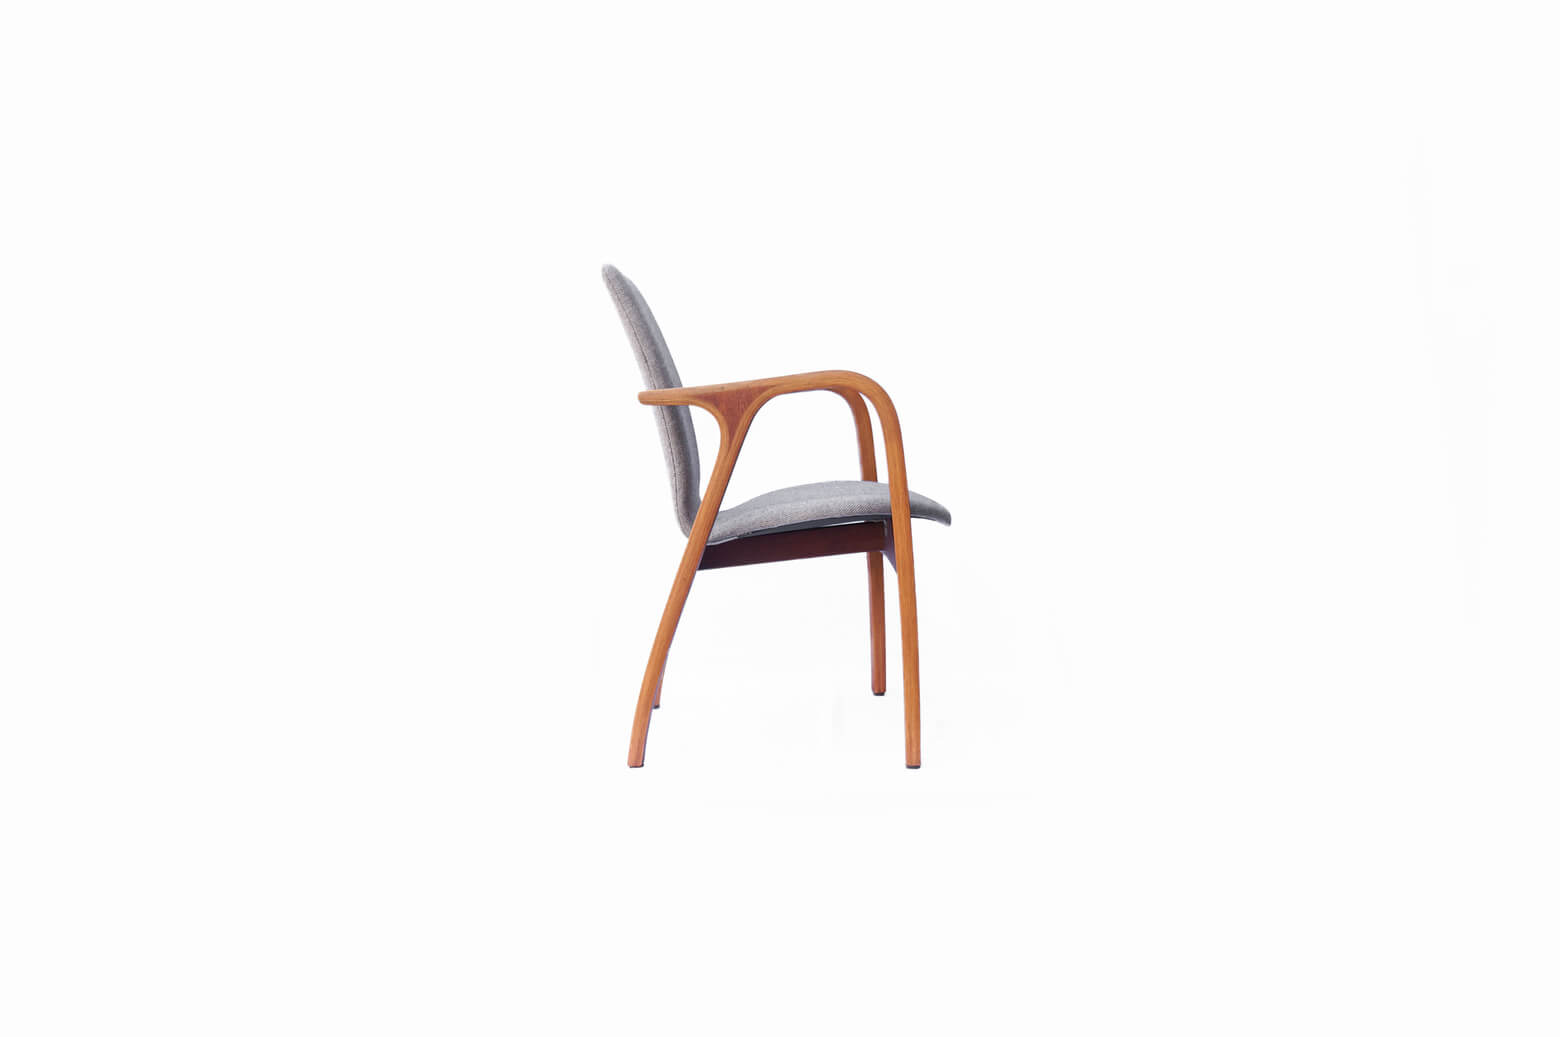 Tendo Antler Arm Chair/天童木工 アントラー アームチェア 坂倉準三建築研究所 チークフレーム プライウッド 廃盤